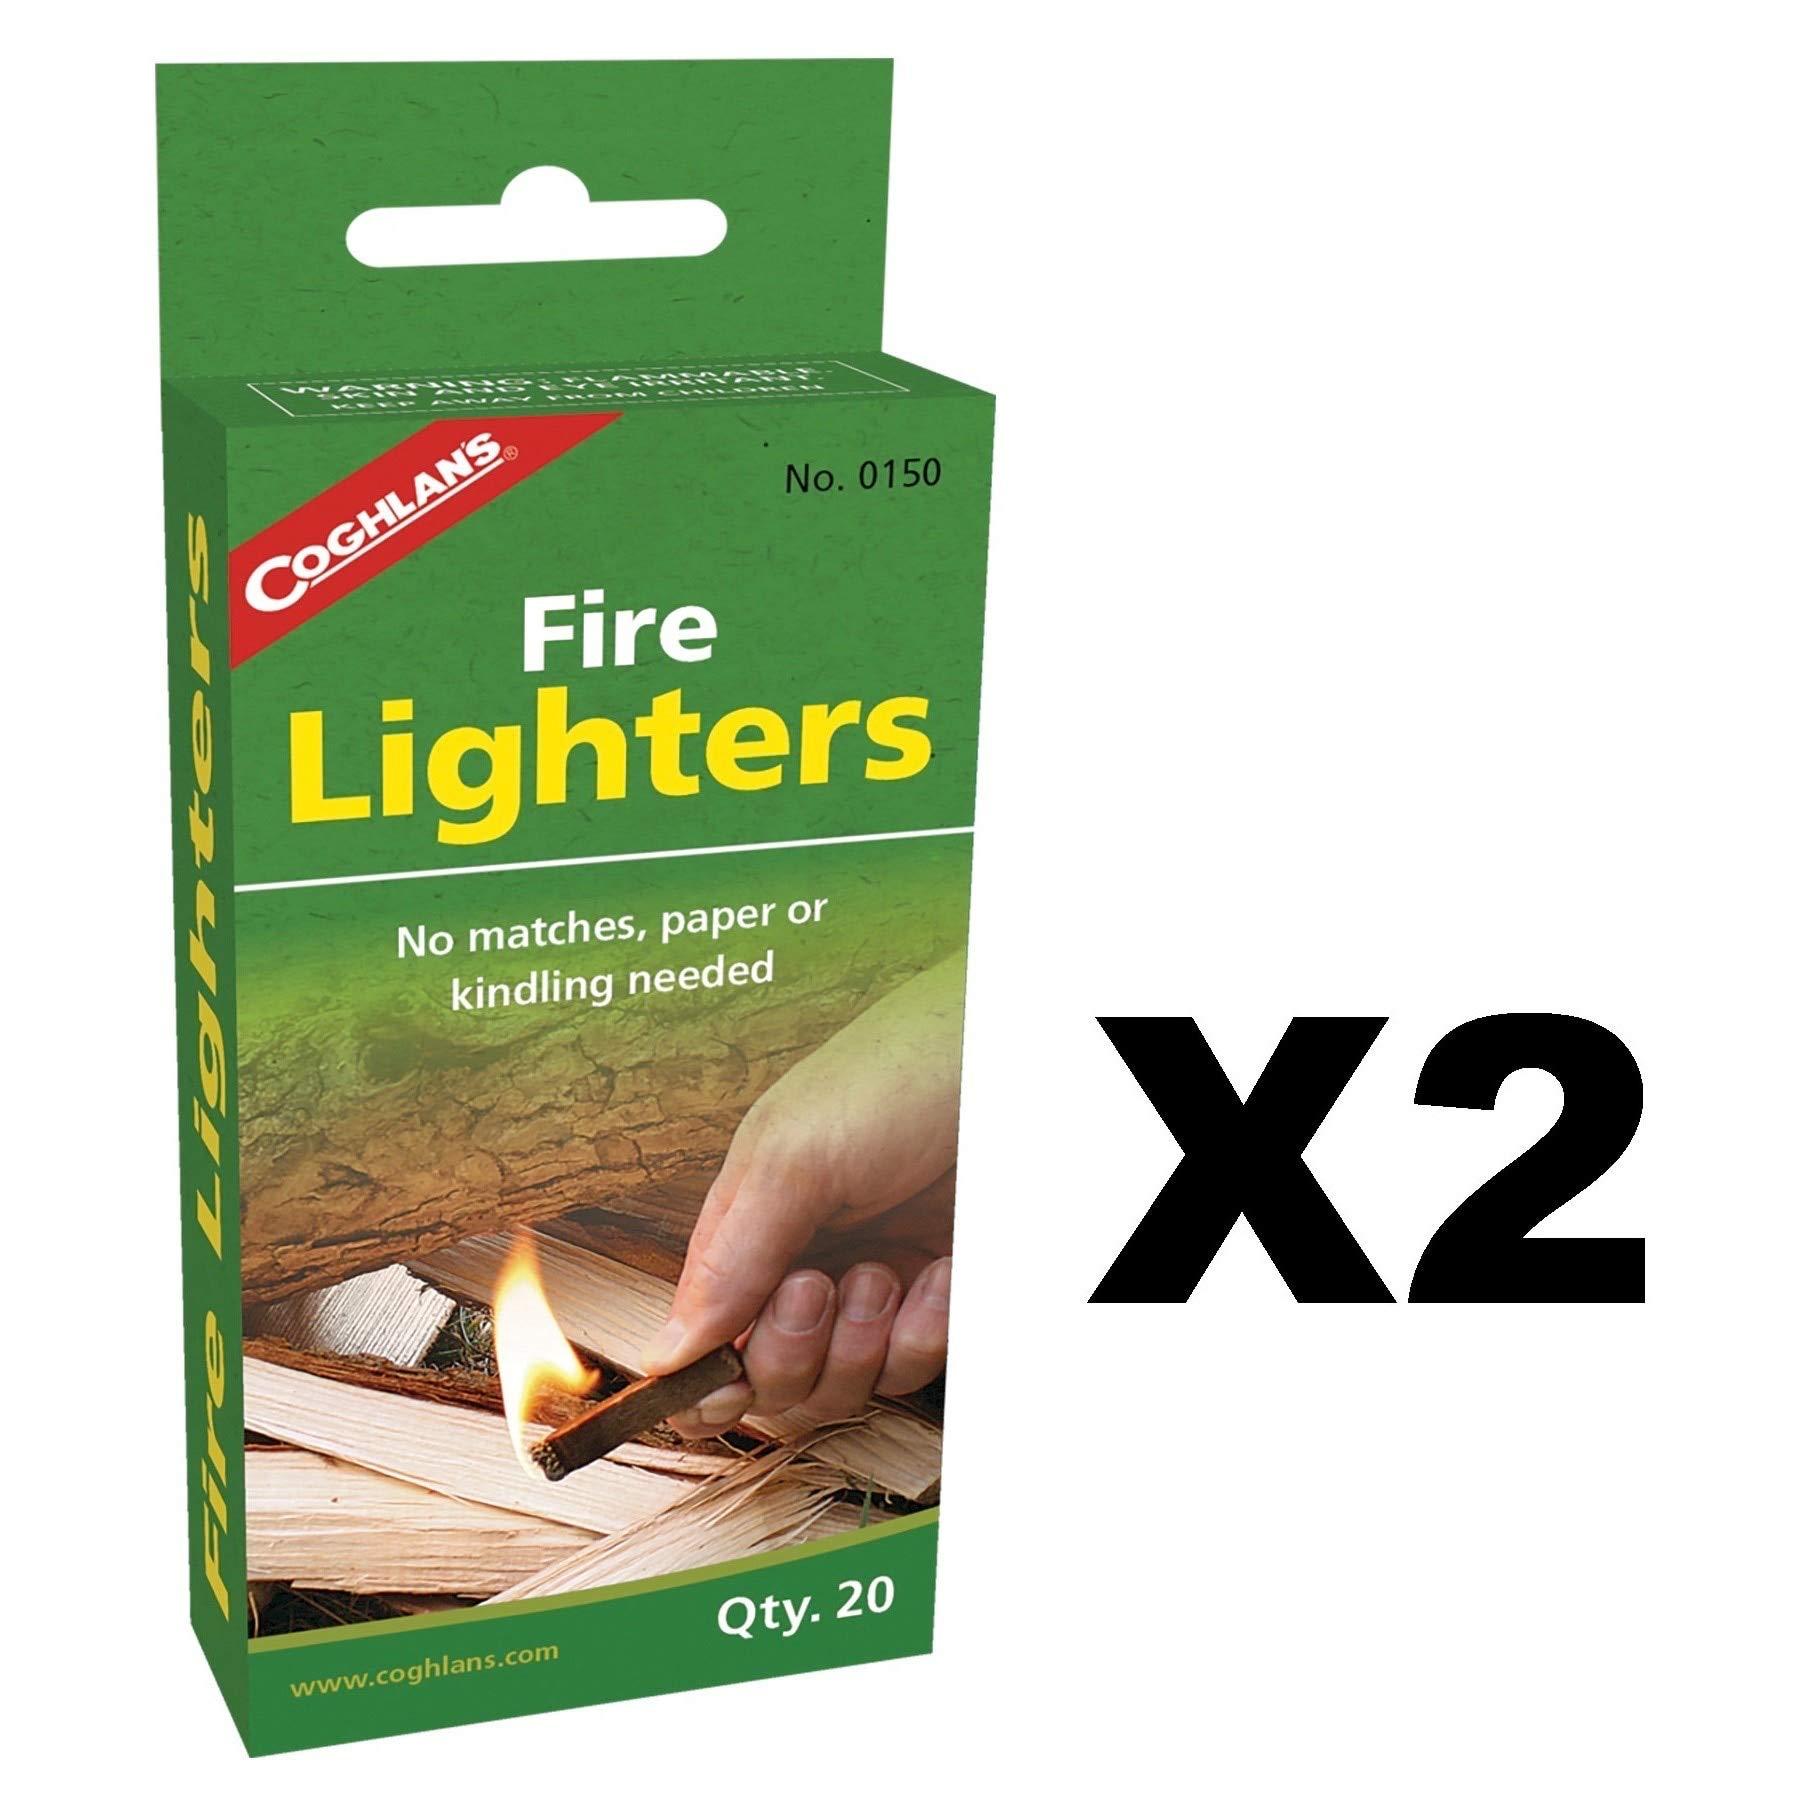 Coghlan's Fire Lighters Odorless Lighters Survival Firestarters (2-Pack of 20) by Coghlan's